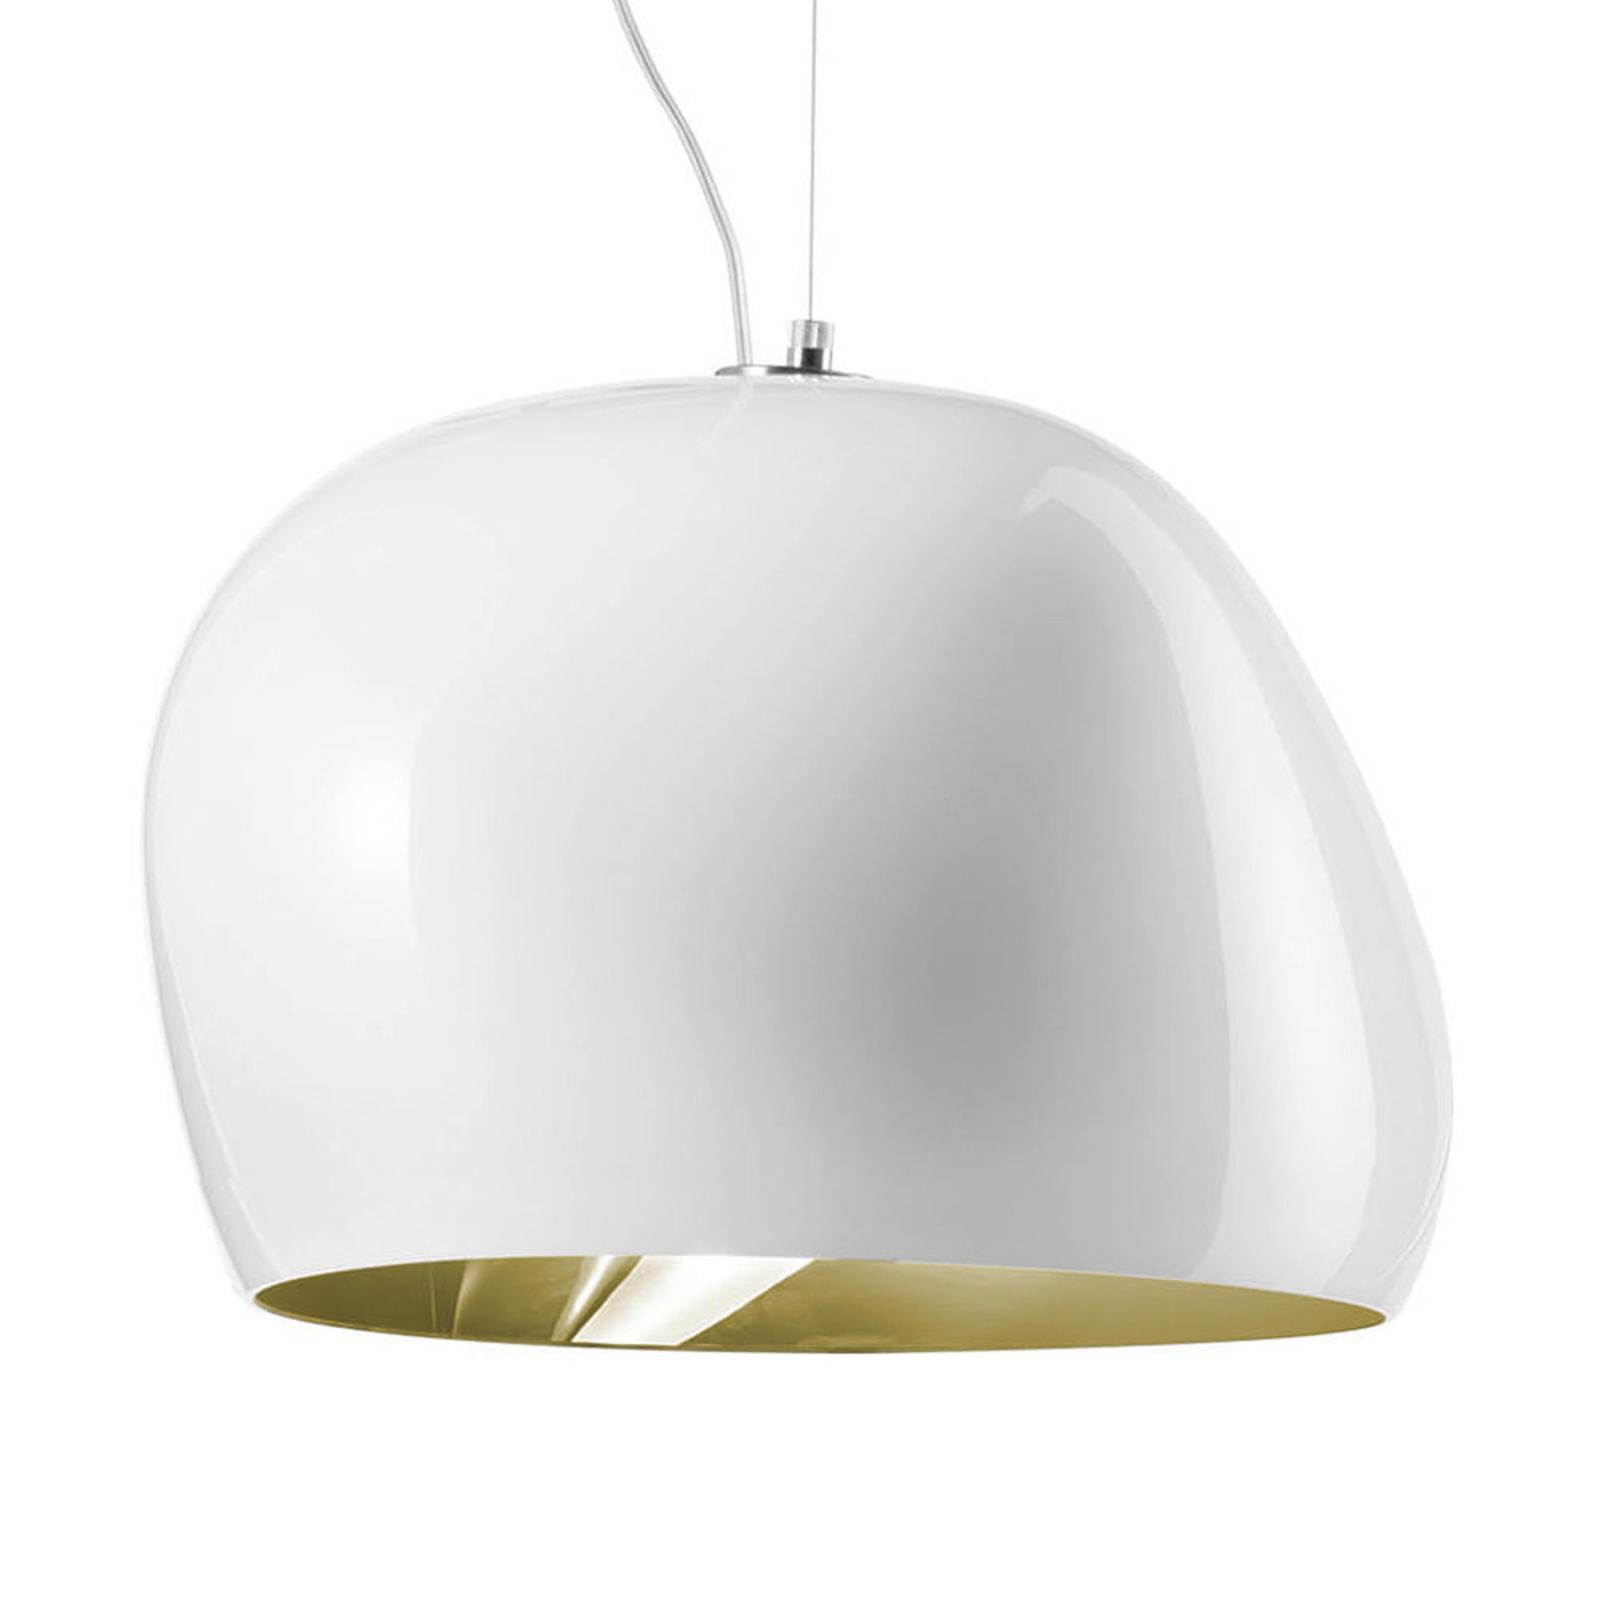 Hanglamp Surface Ø 40 cm, E27 wit/oudgroen